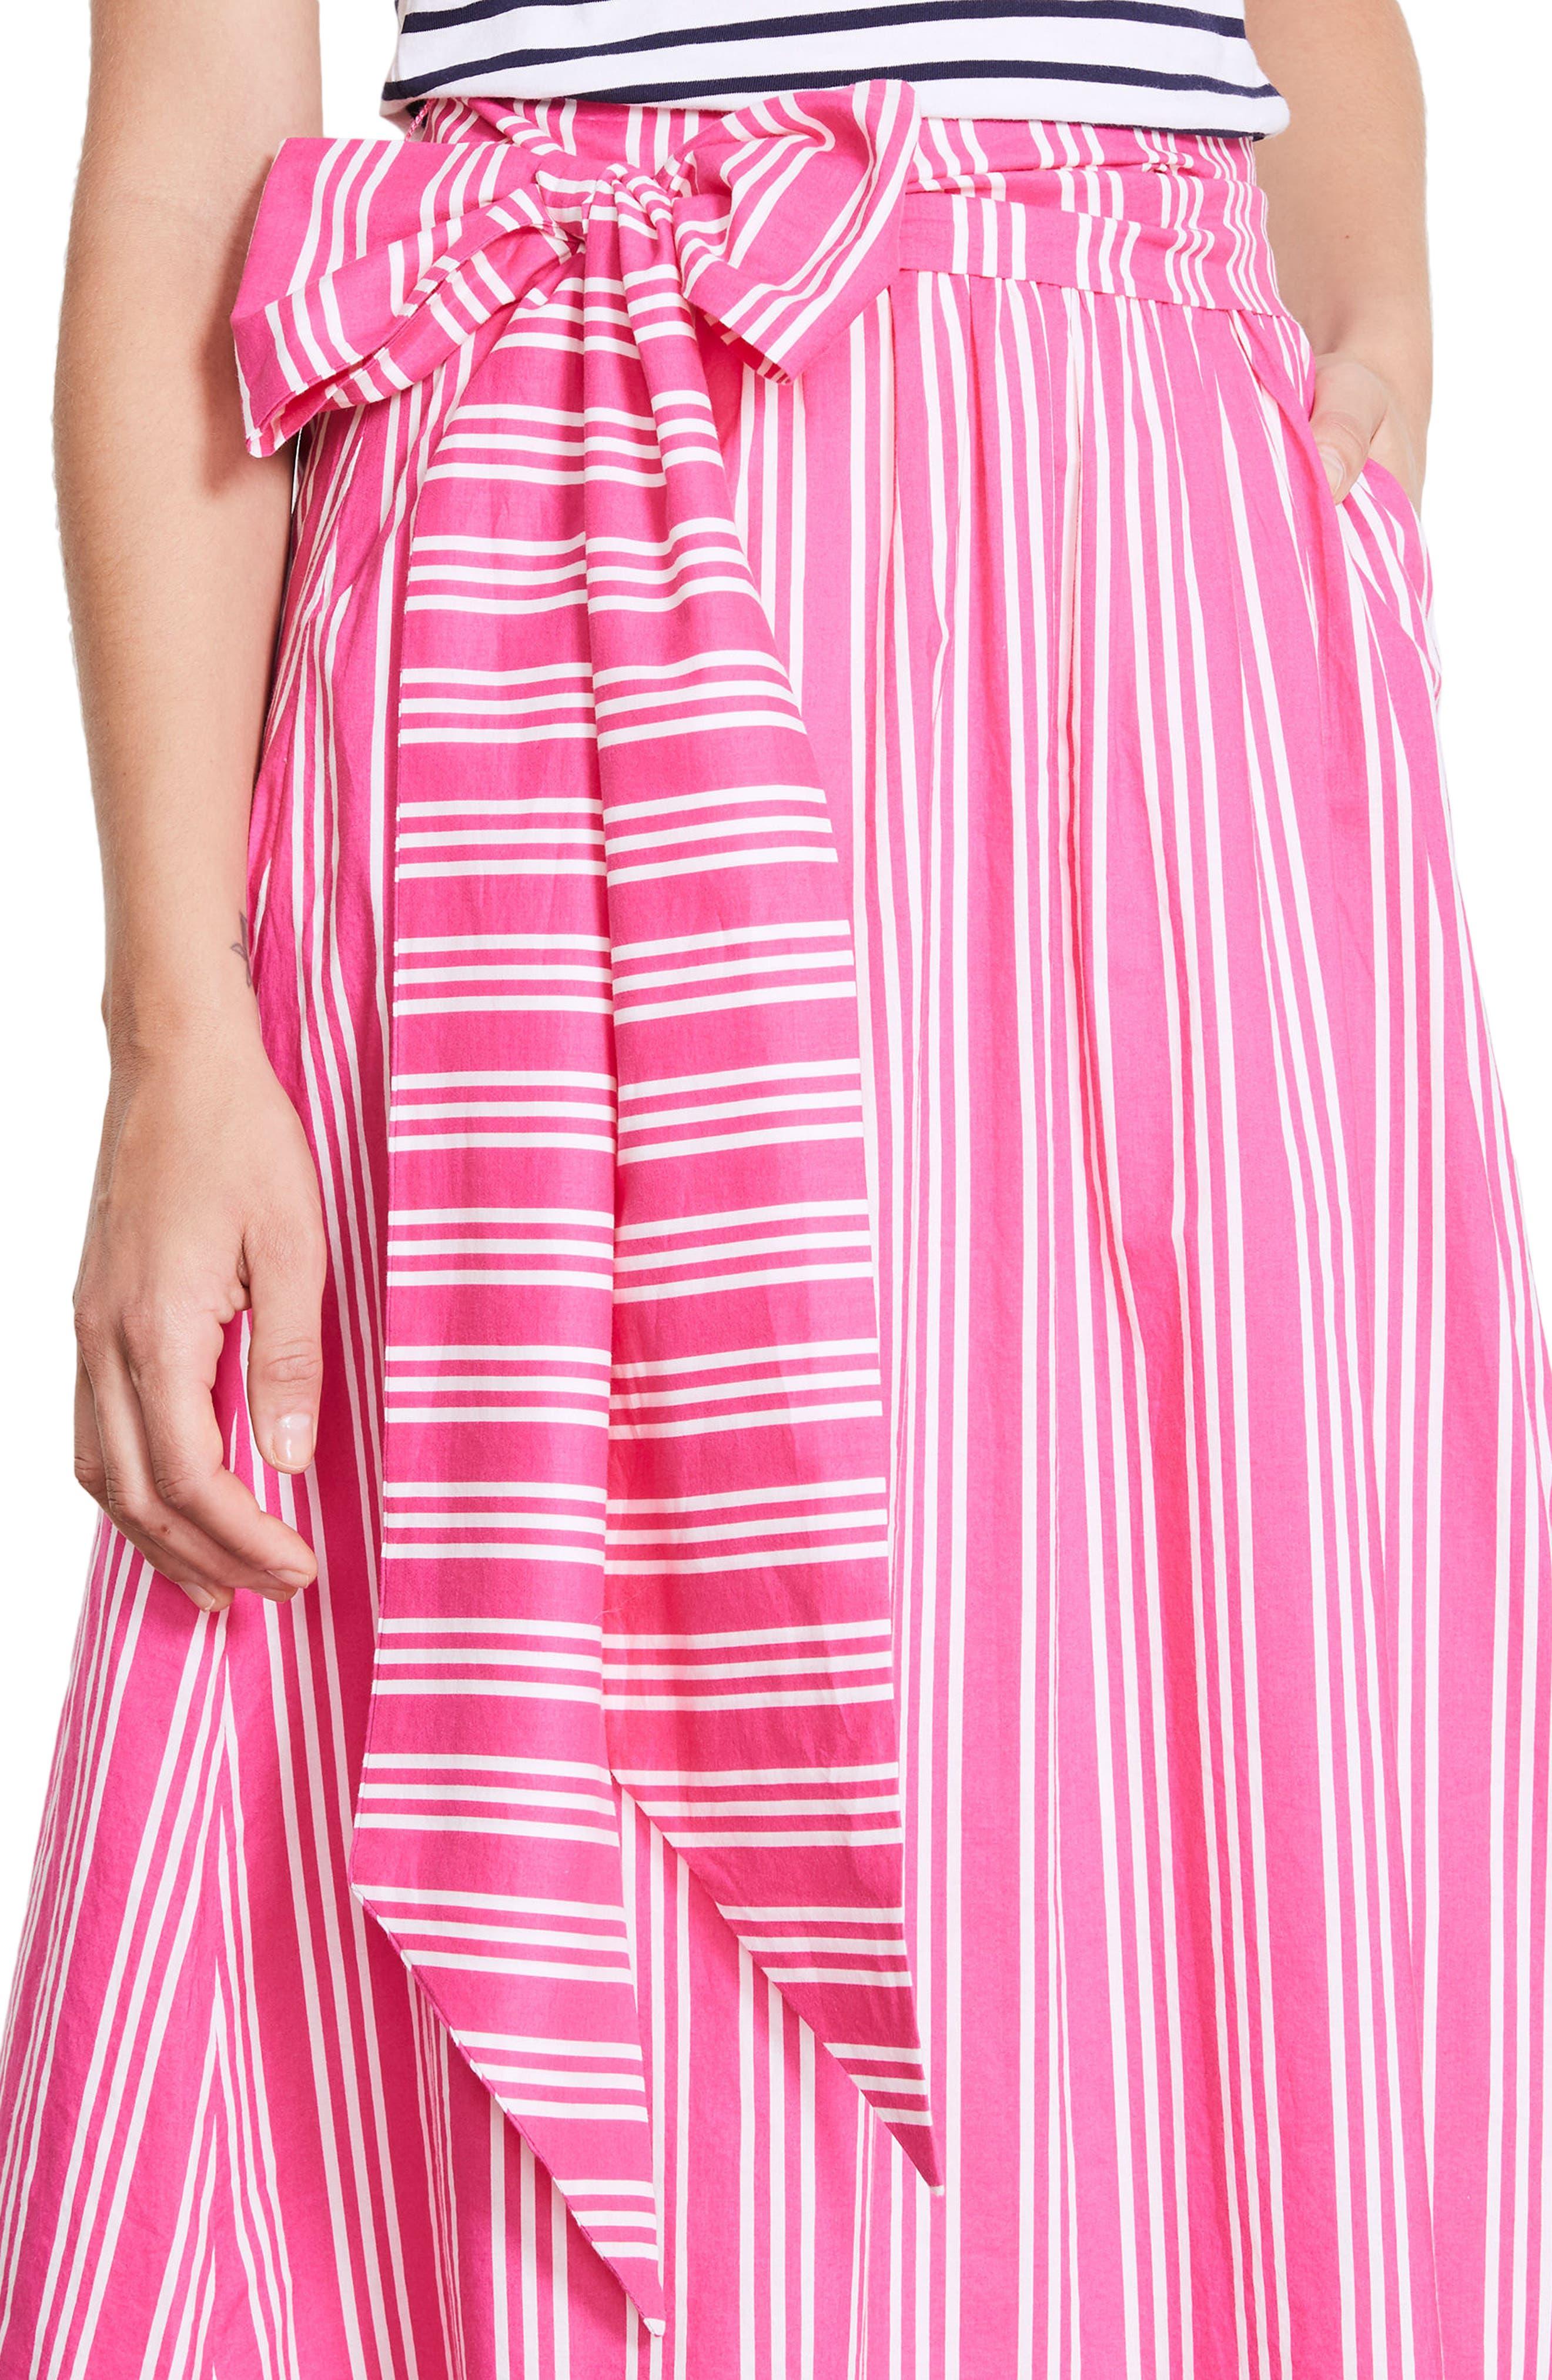 Kiera Midi Skirt,                             Alternate thumbnail 4, color,                             Party Pink And Ecru